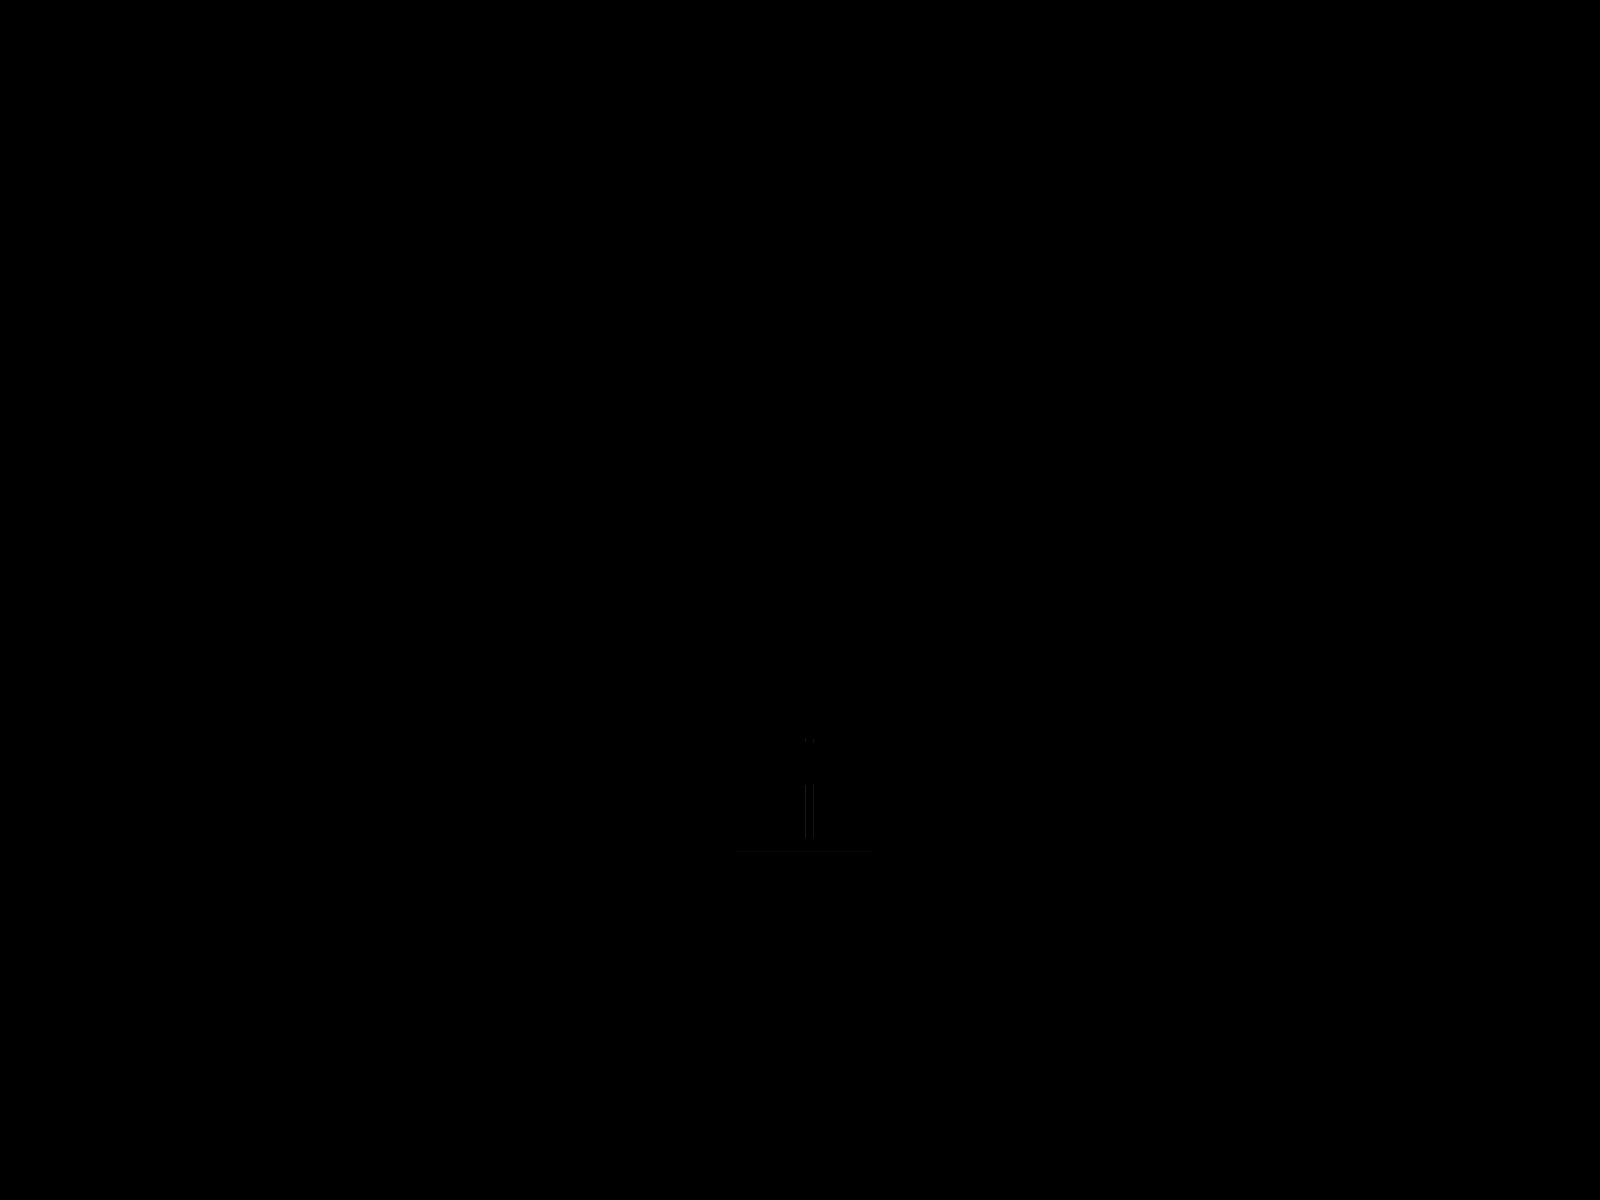 AE 02